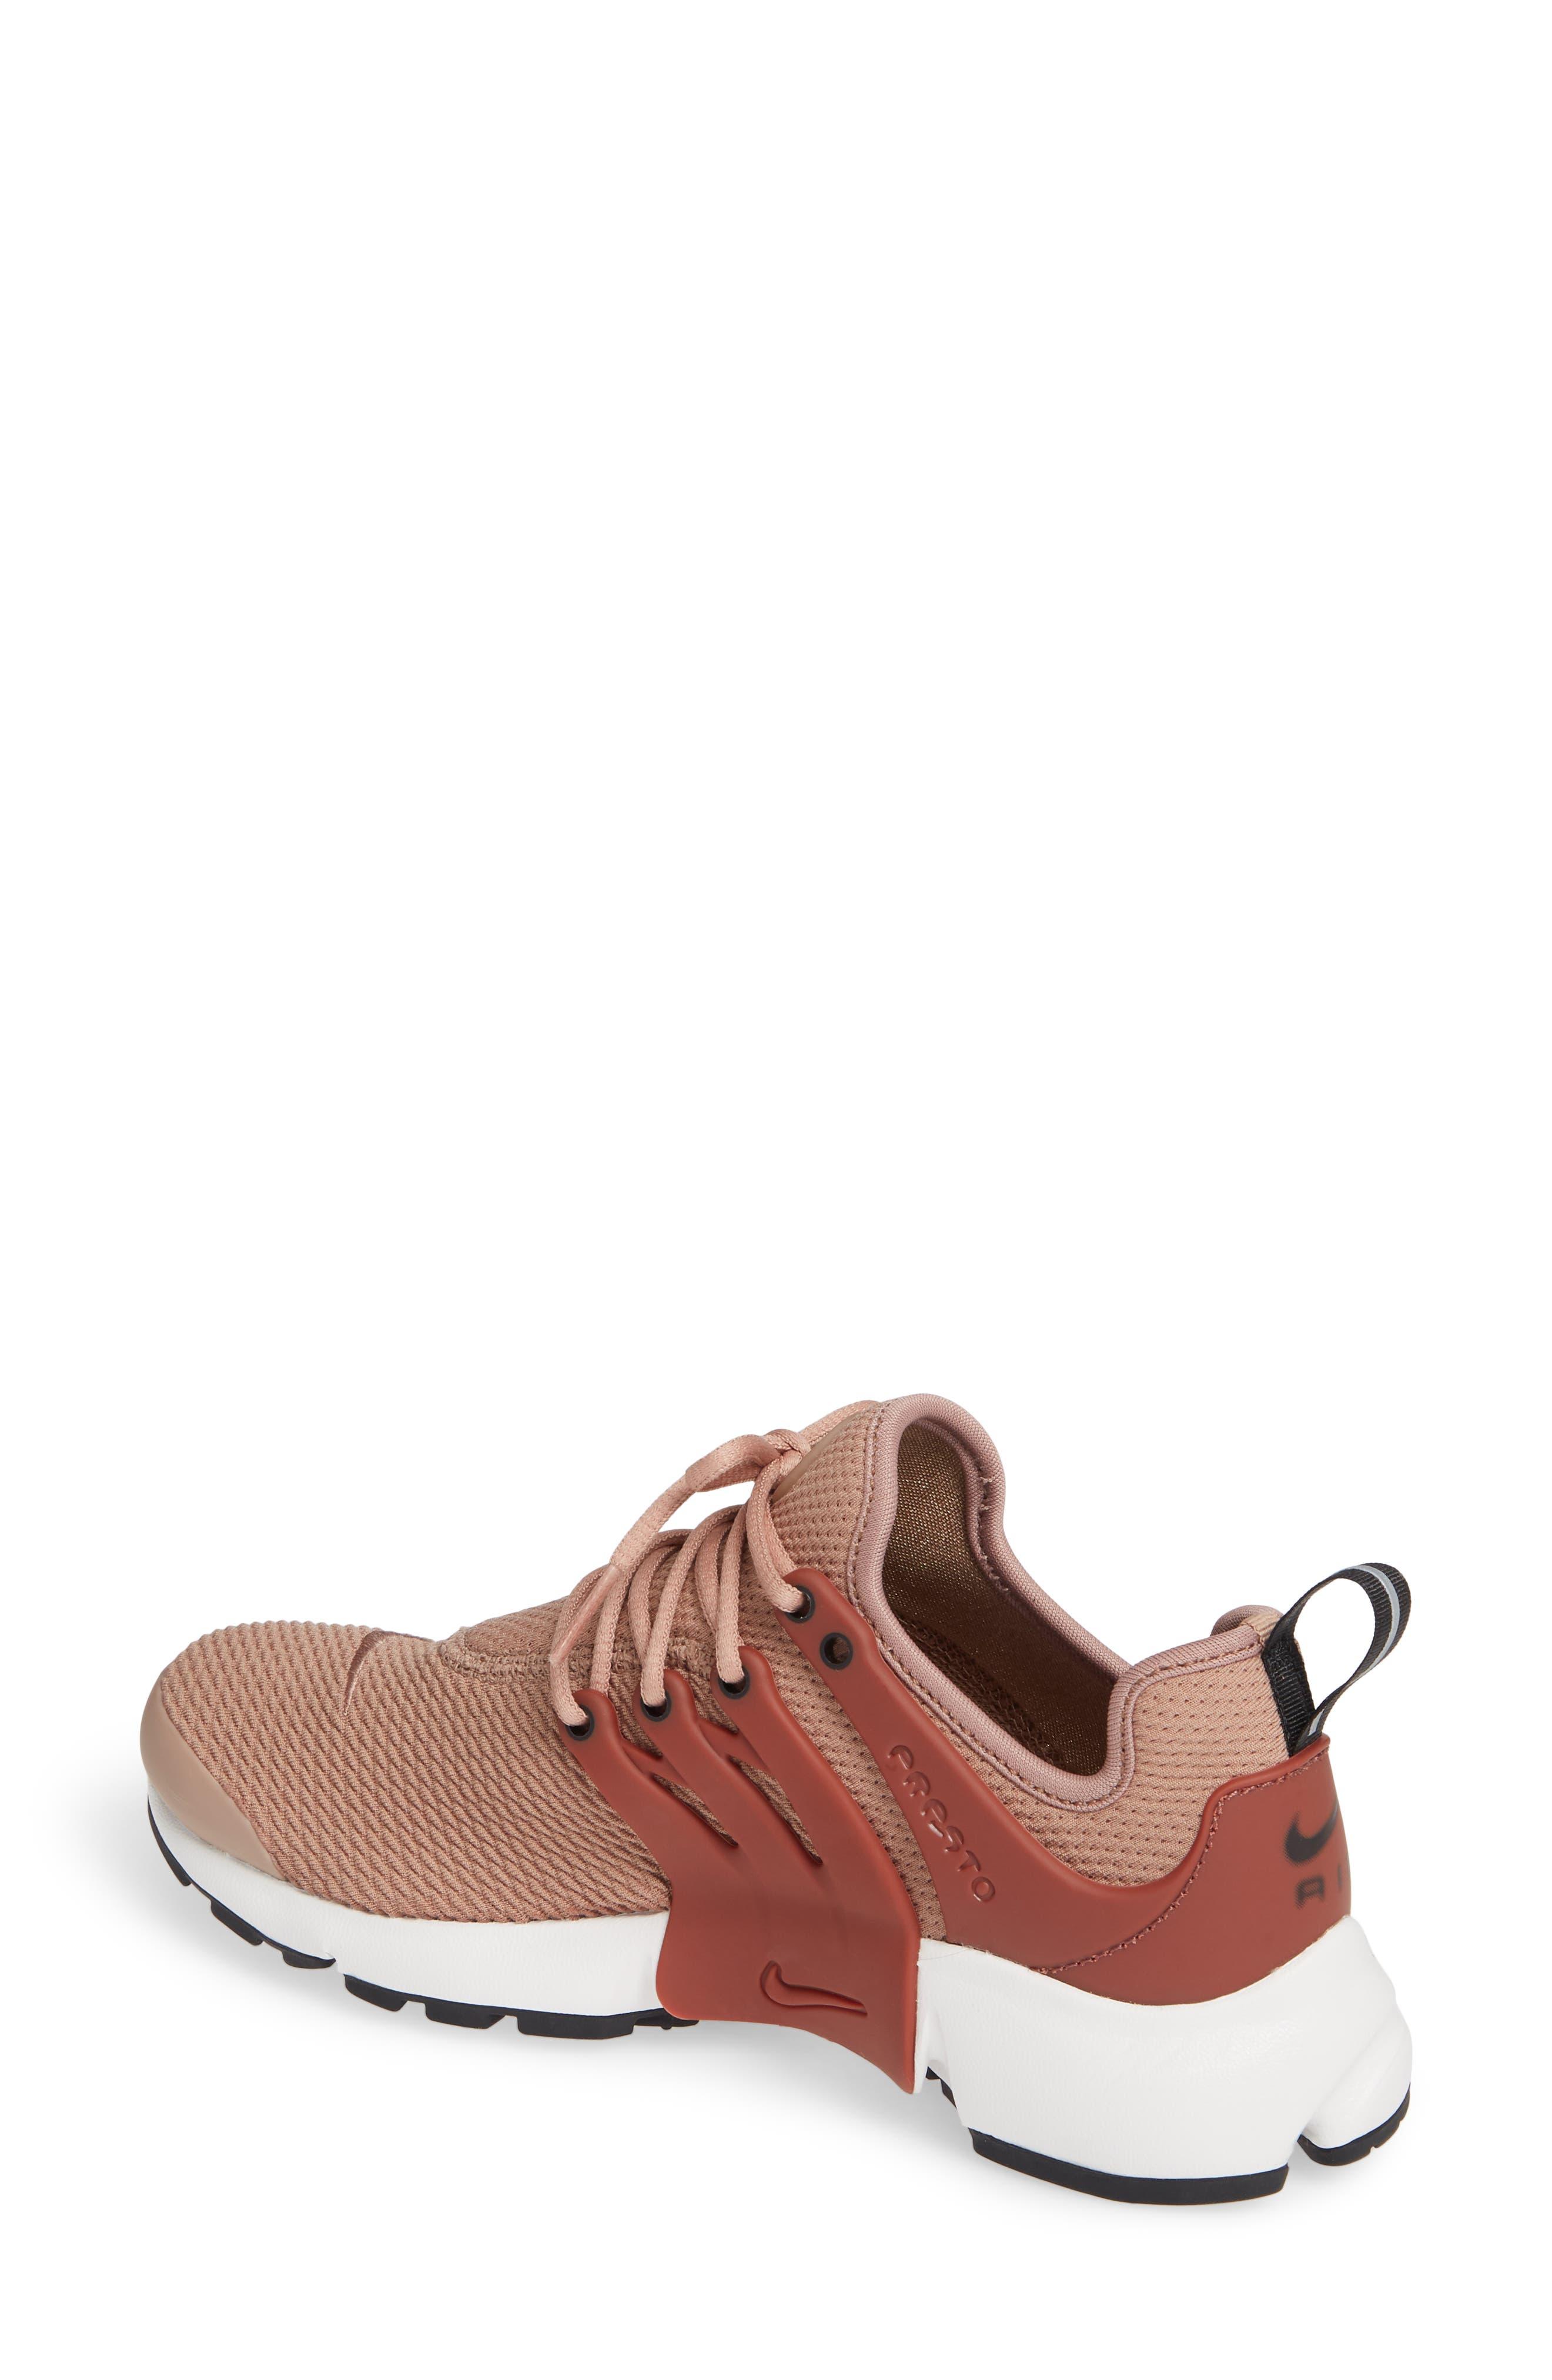 Air Presto Sneaker,                             Alternate thumbnail 2, color,                             251